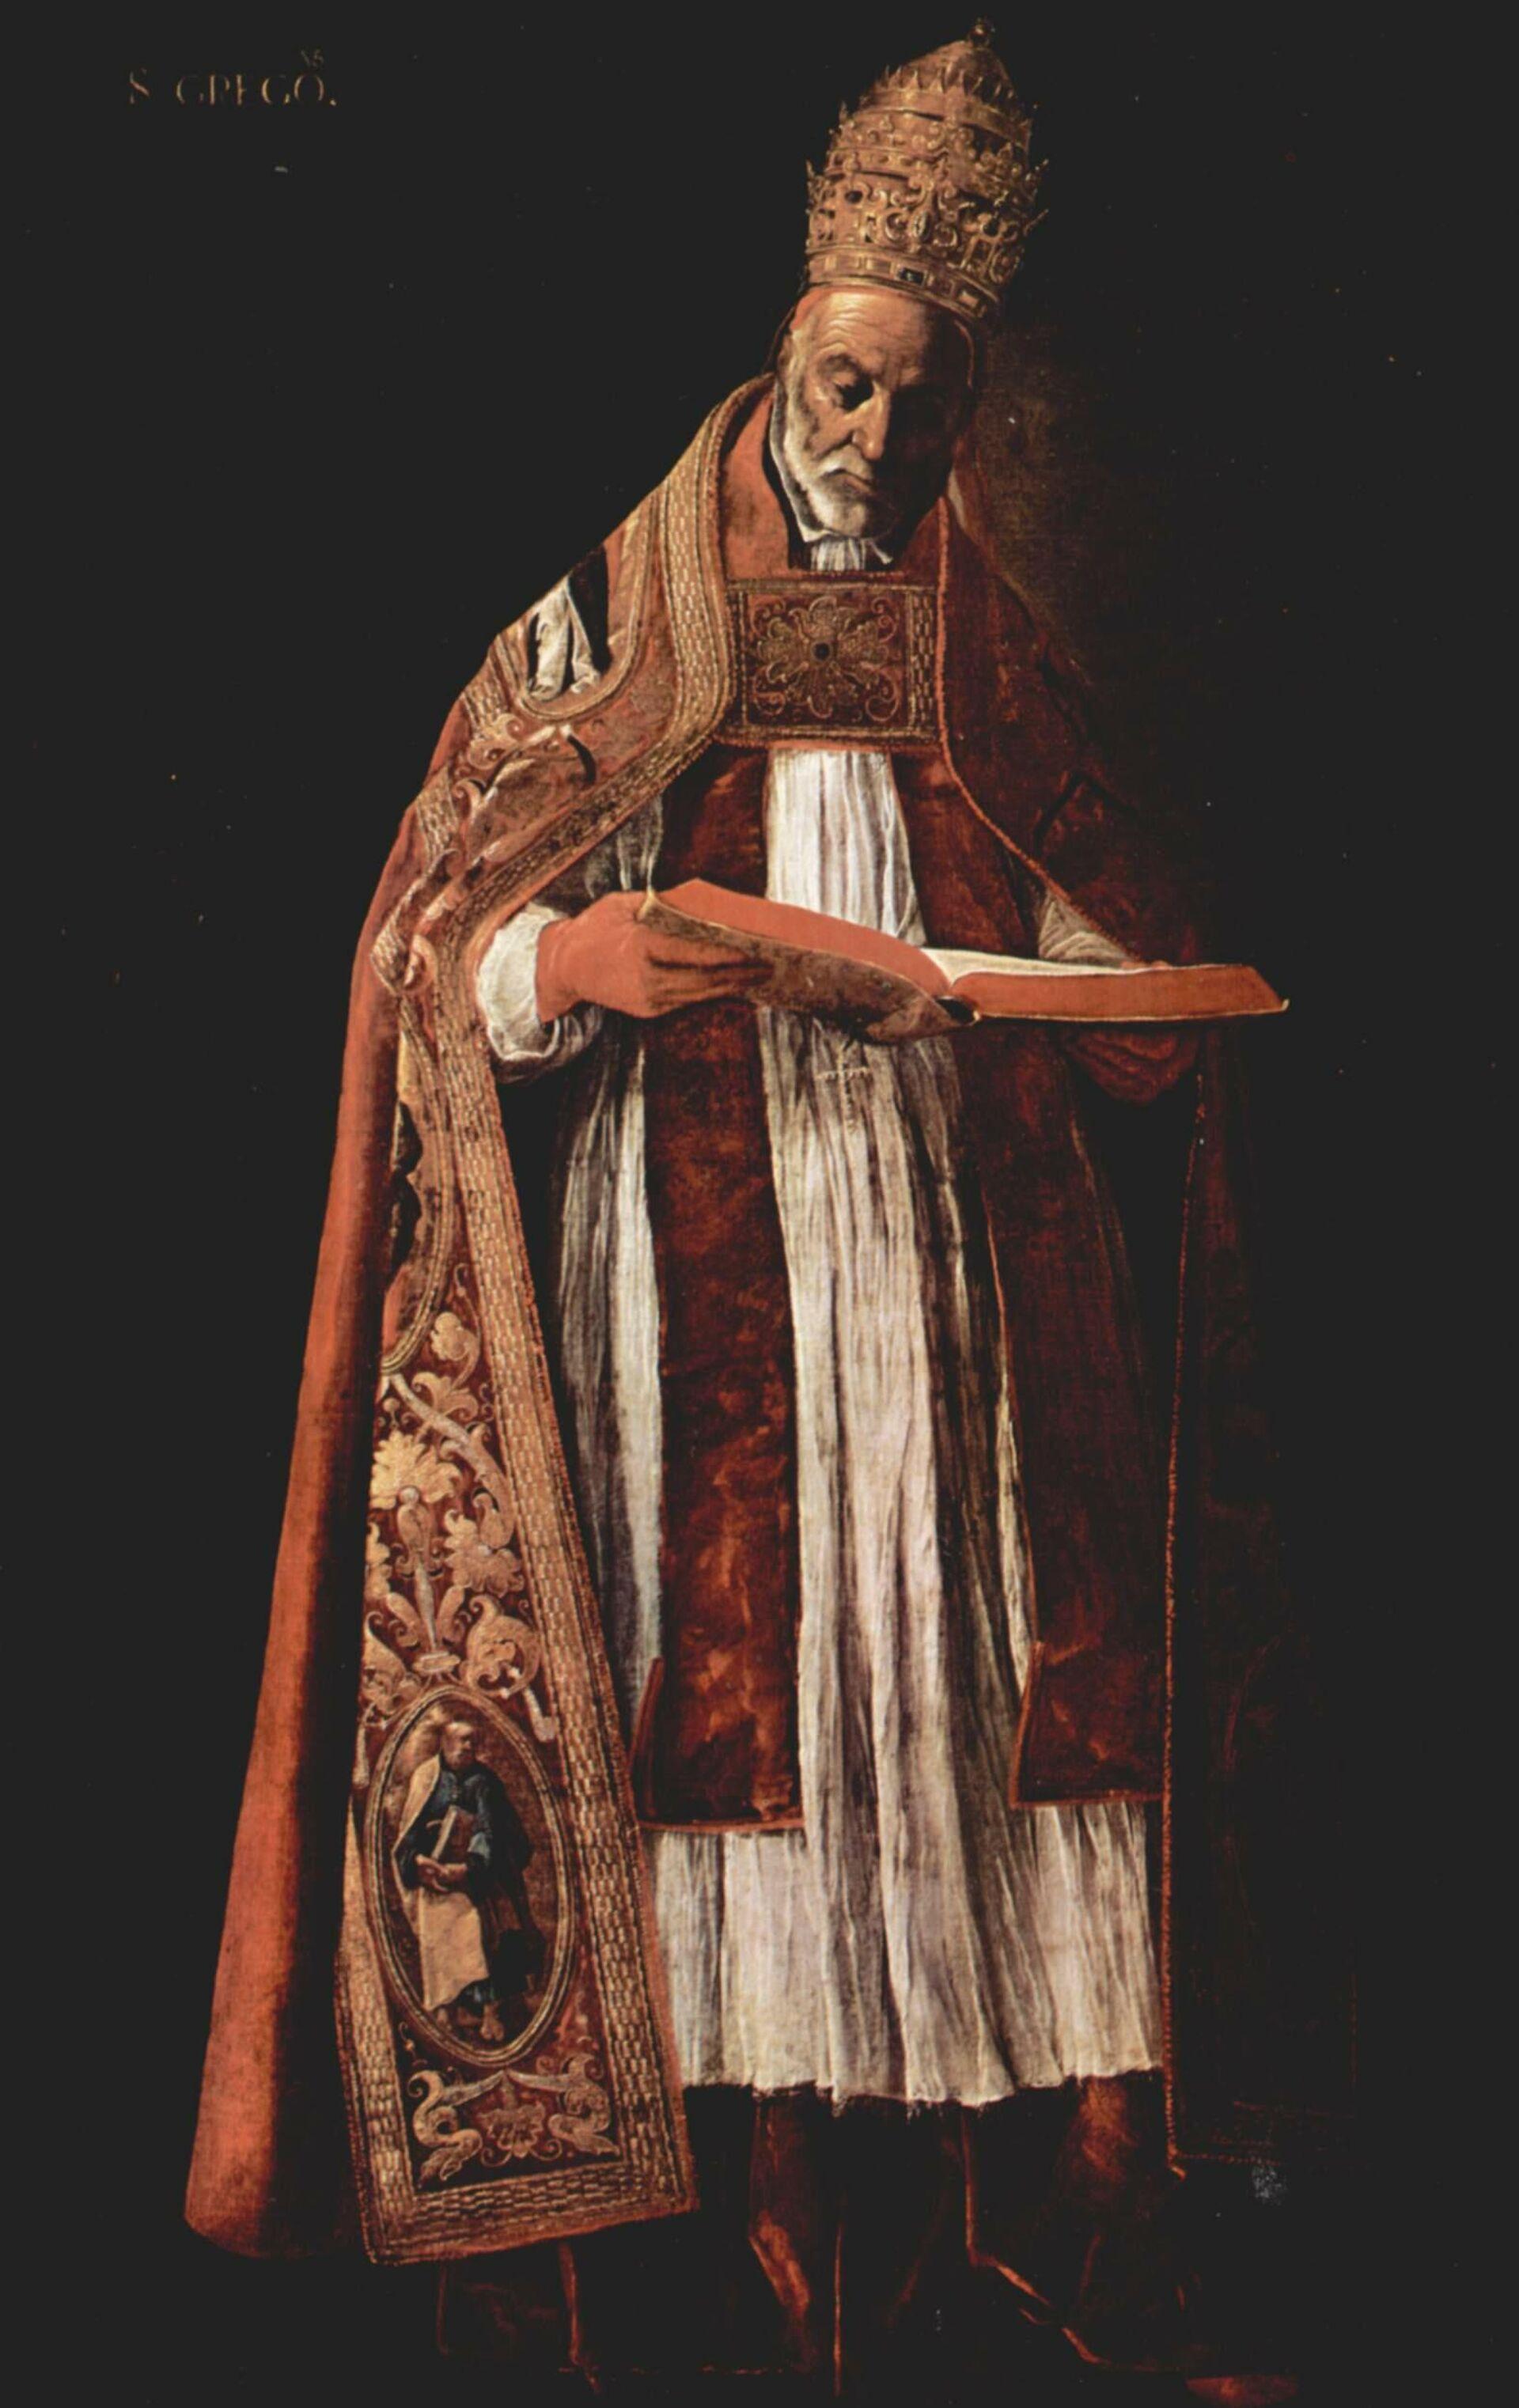 Картина де Сурбарана Папа римский Григорий I - ПРОФИ Новости, 1920, 03.08.2021